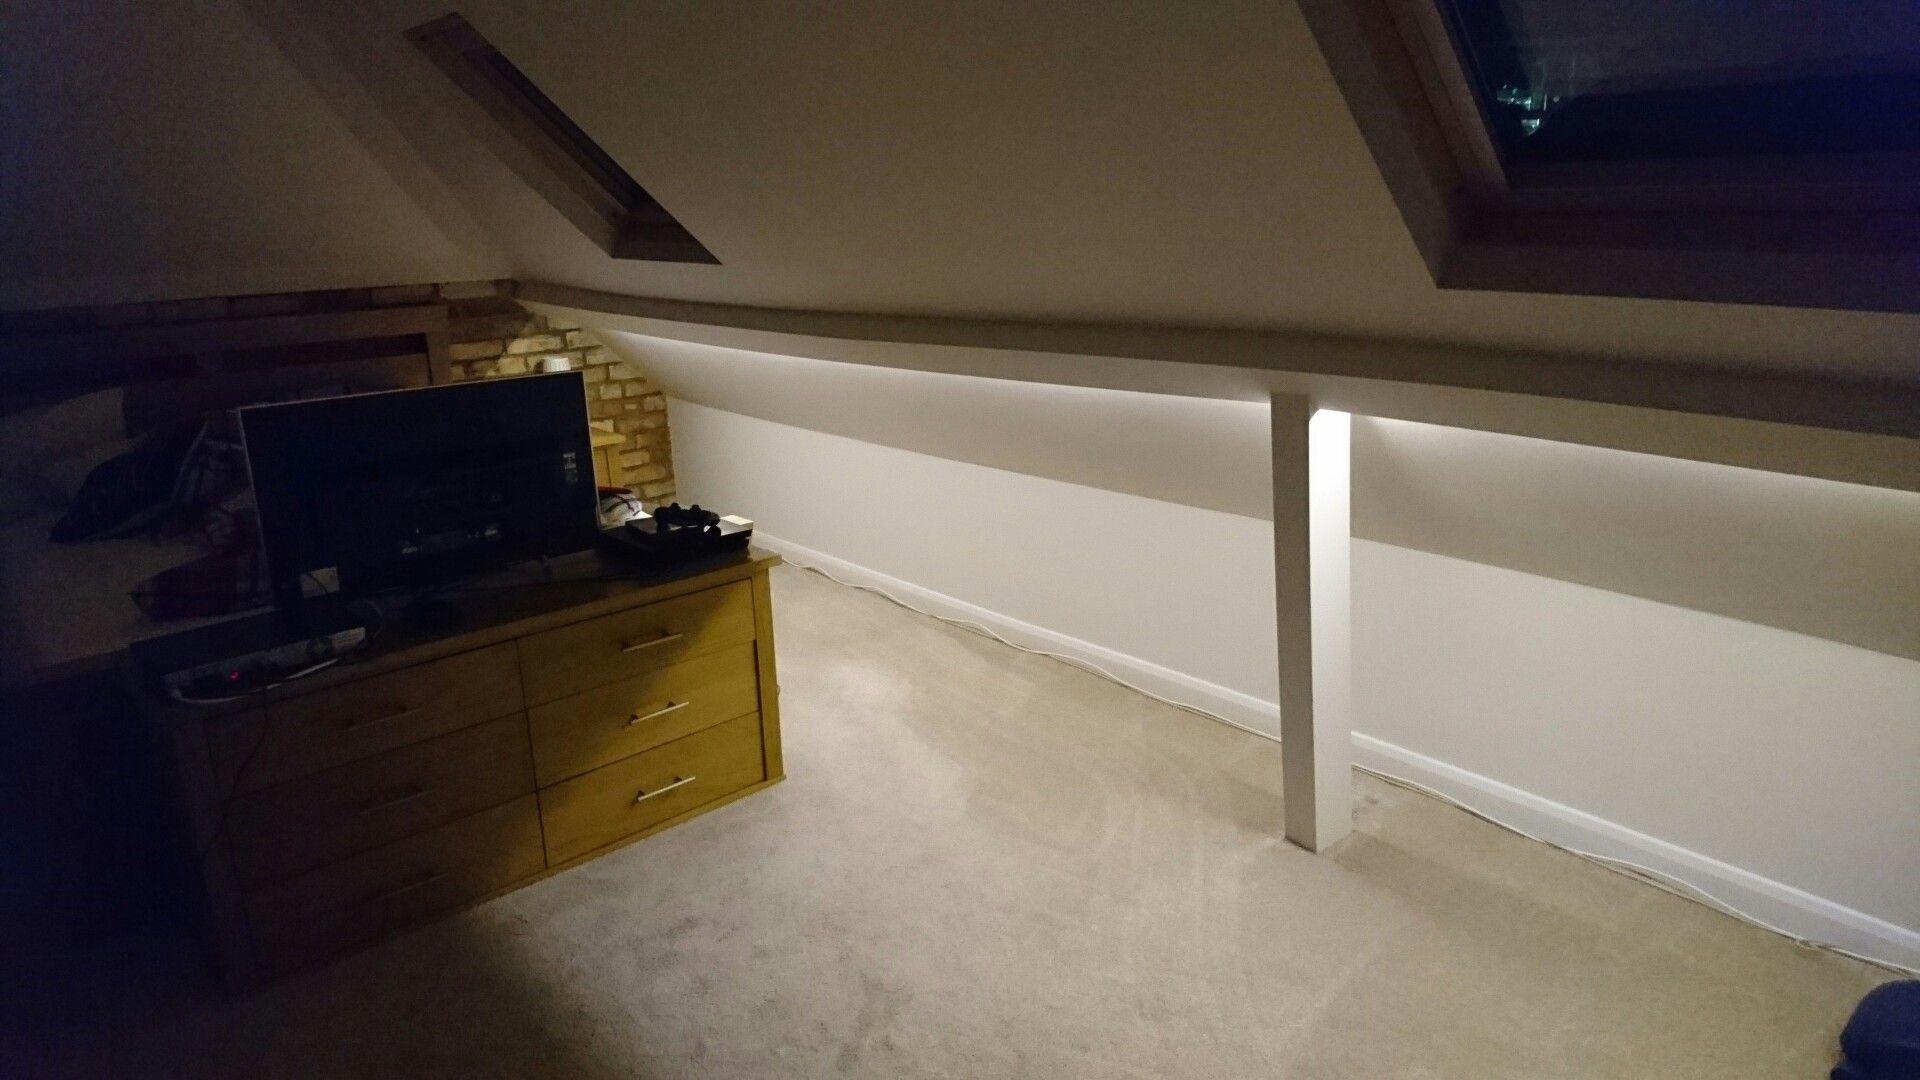 reputable site 56d63 b6b2c LED strip lighting in a loft room #BeamLighting #LED   LED ...